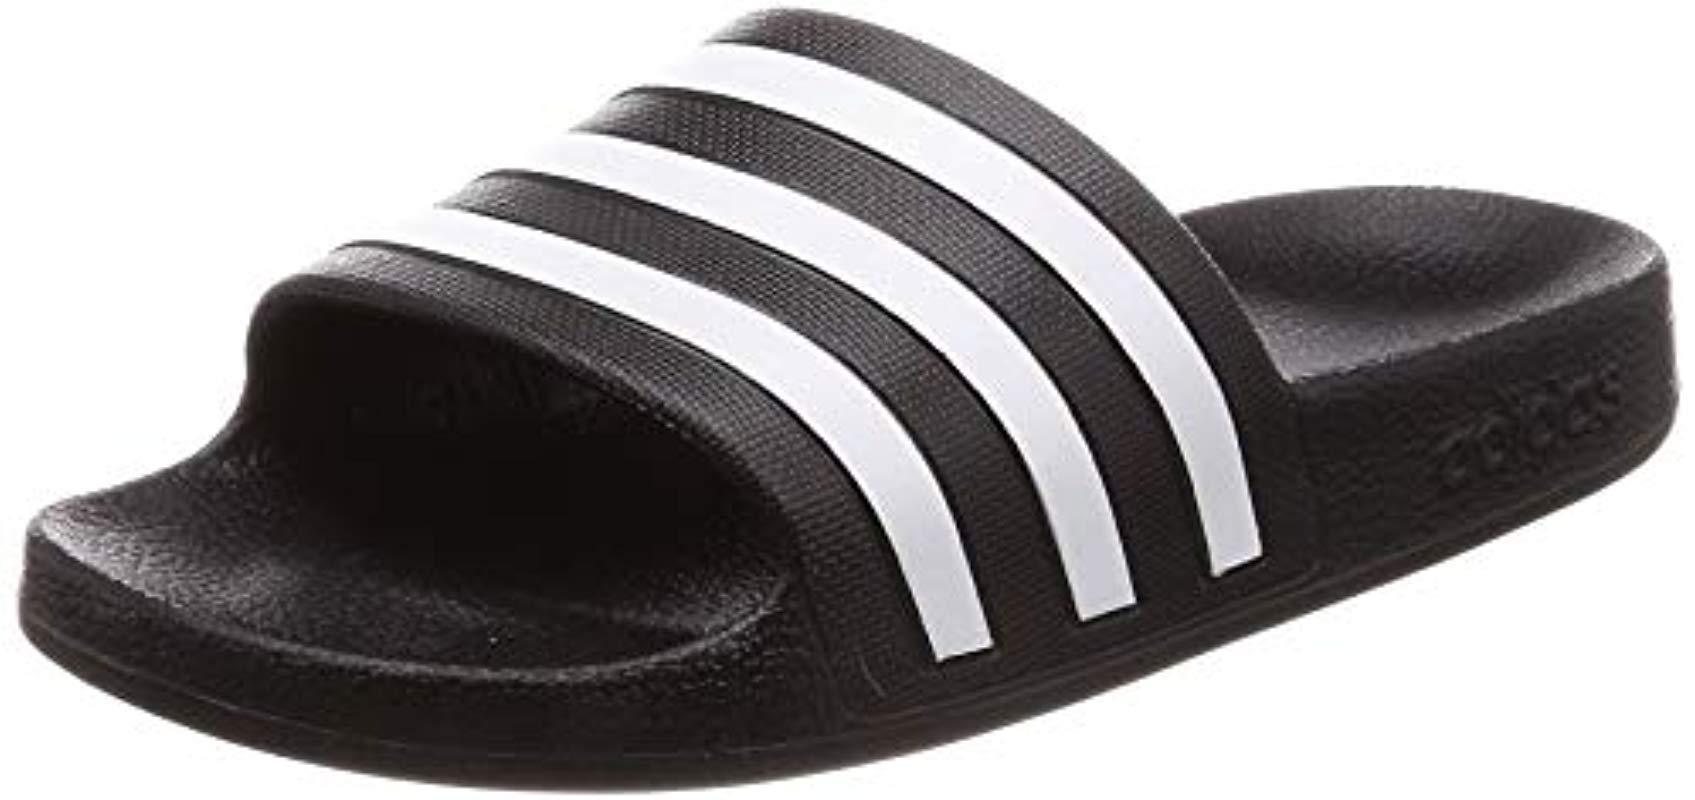 bef7dabb4 Adidas Unisex Adults  Adilette Aqua Beach   Pool Shoes in Black for ...